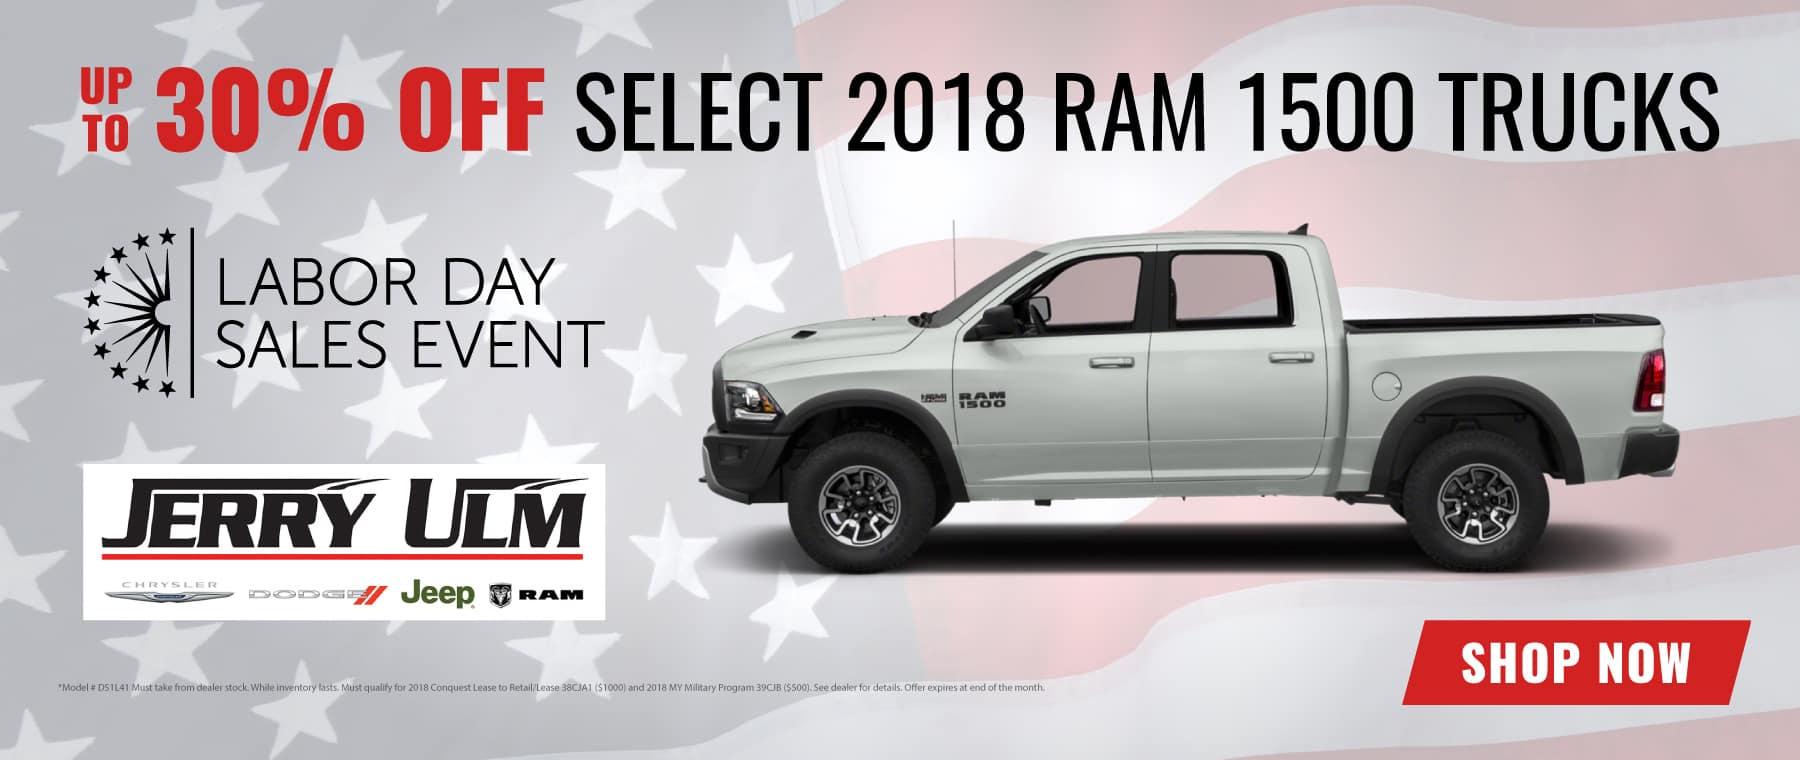 2018 RAM Truck special